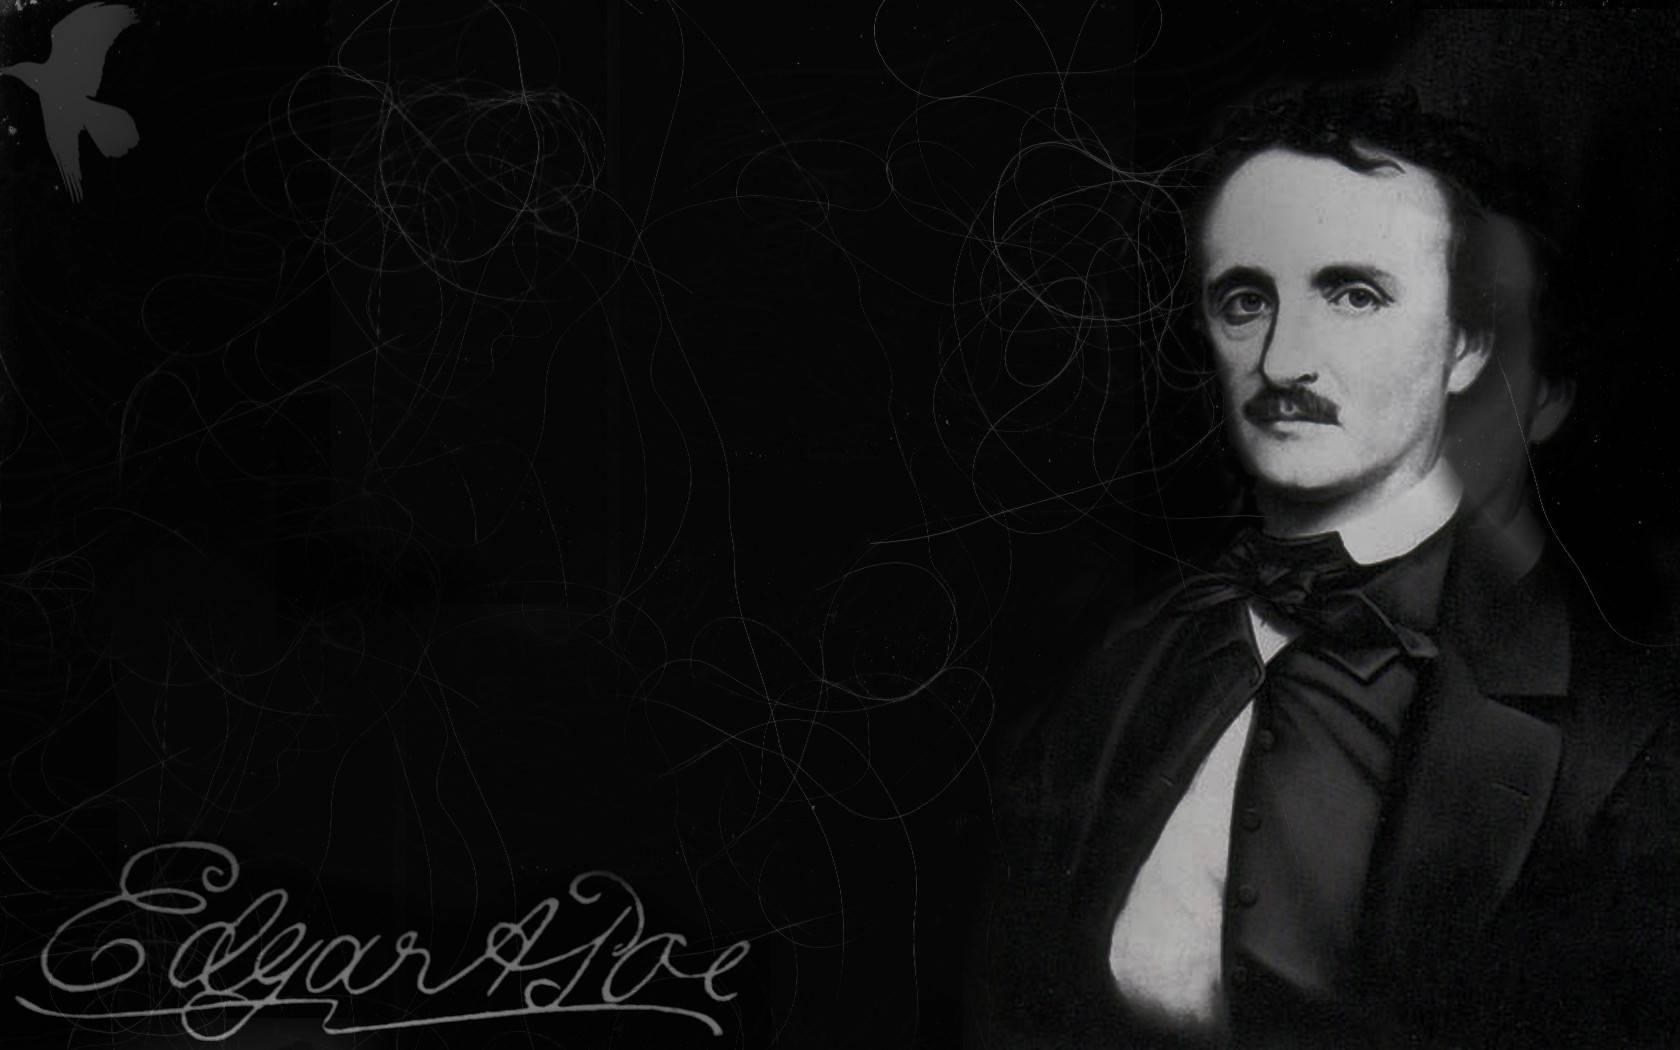 Edgar Allan Poe Wallpapers Wallpaper Cave HD Wallpapers Download Free Images Wallpaper [1000image.com]